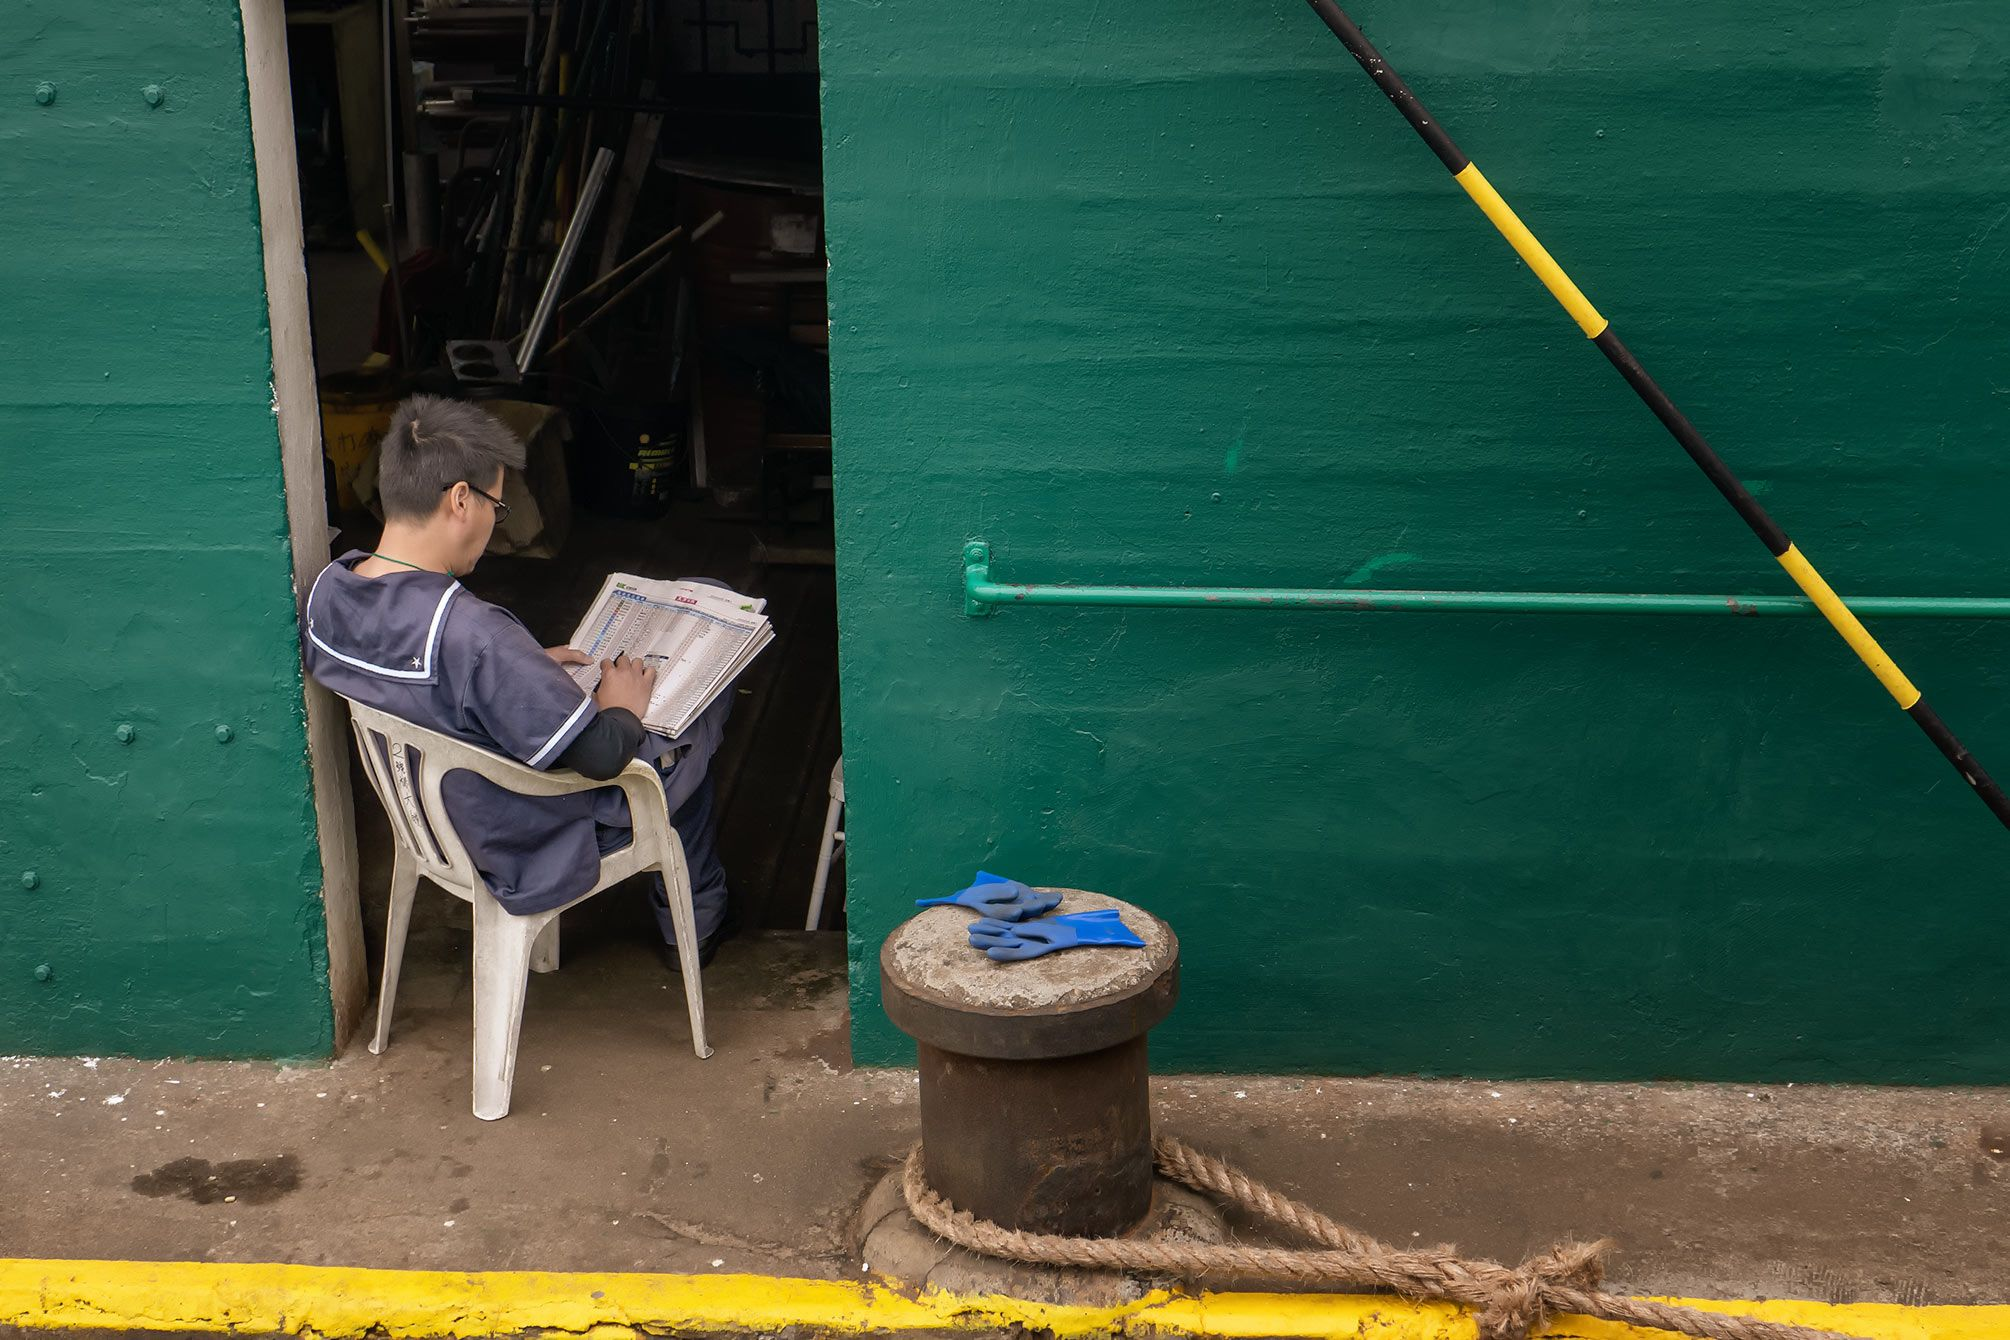 reading star ferry employee